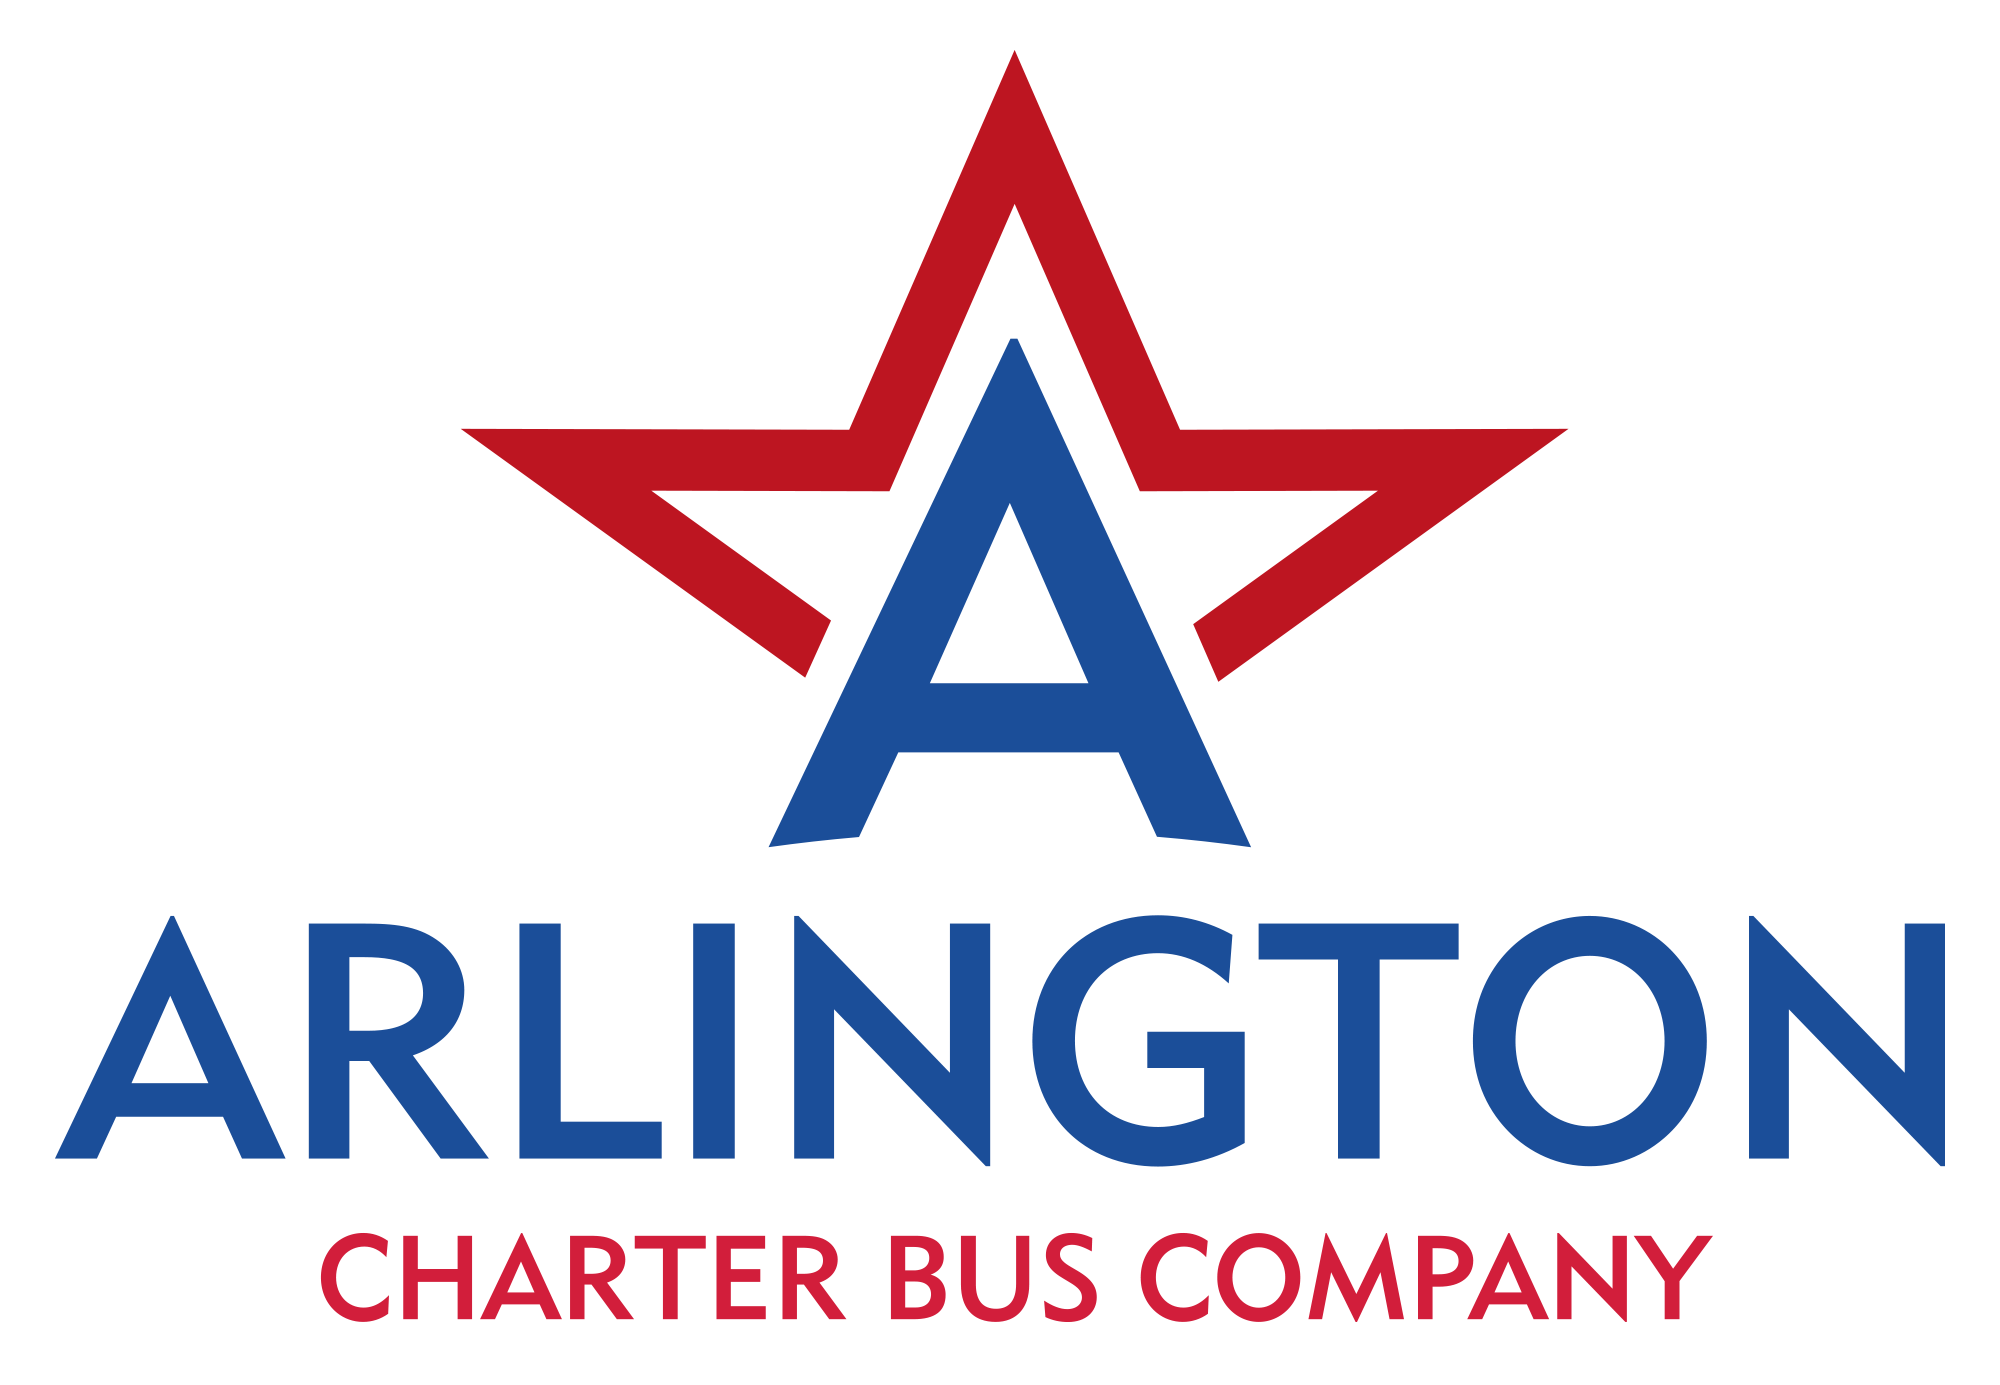 Arlington charter bus